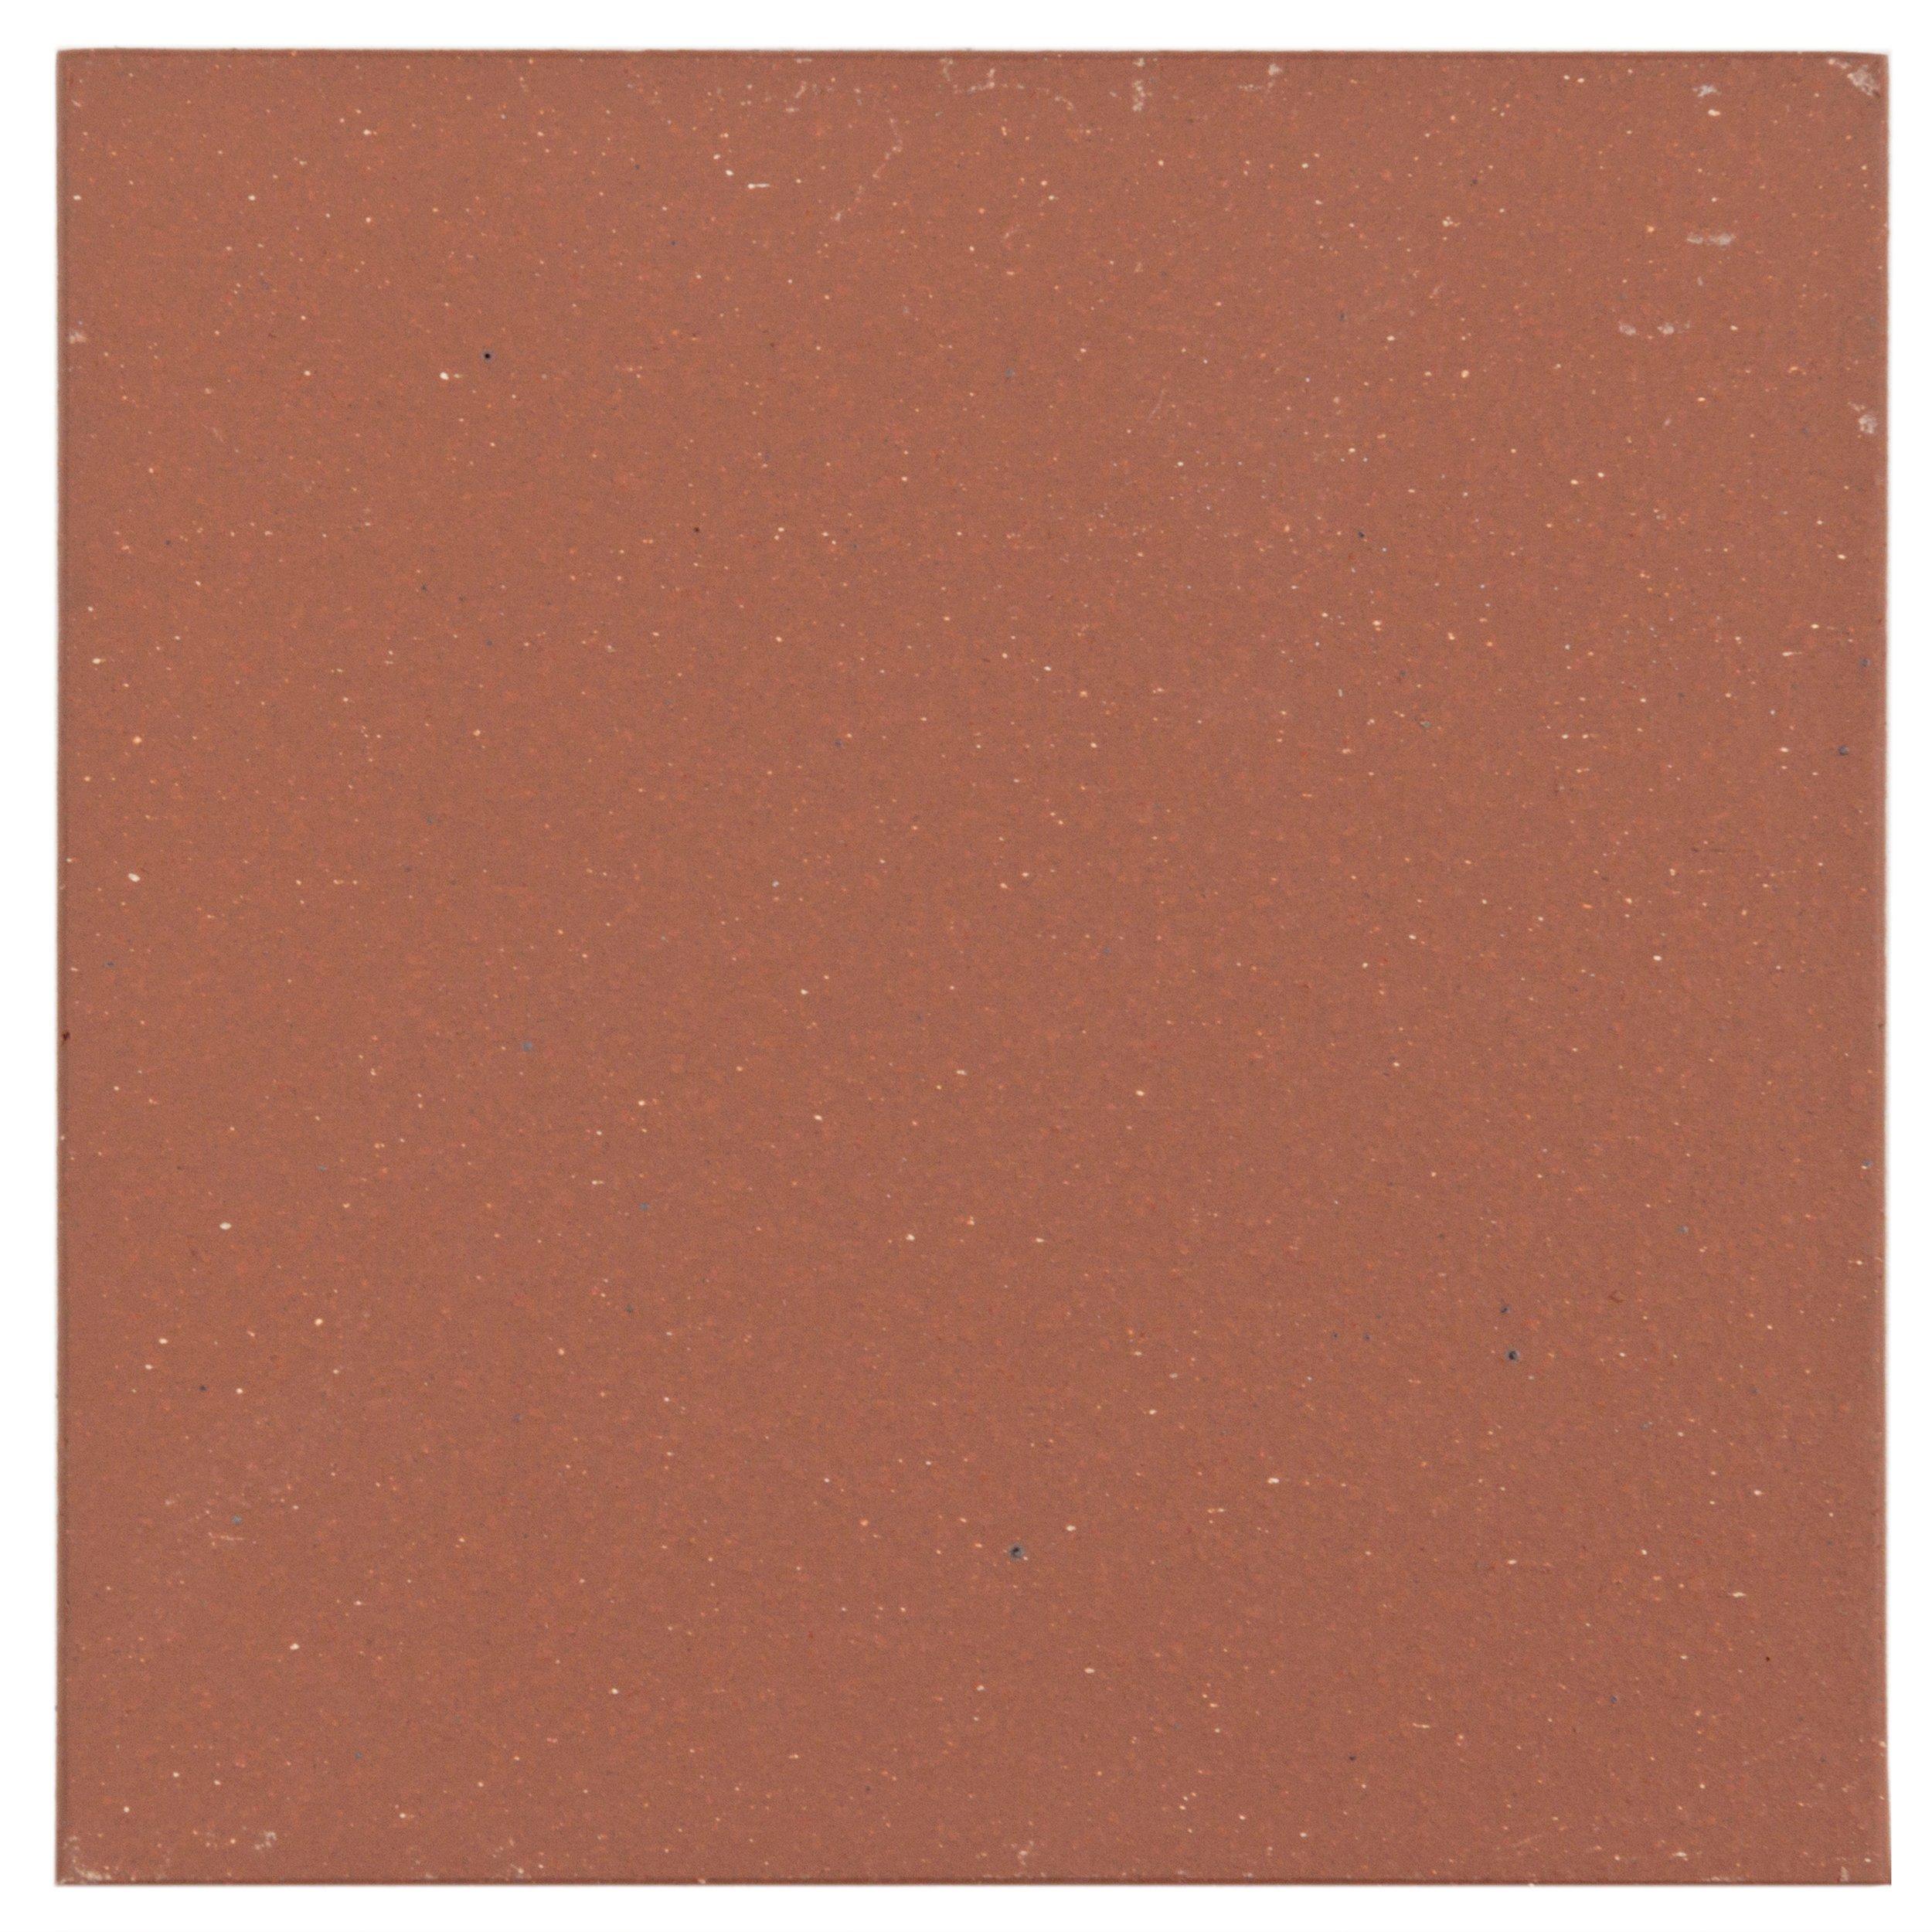 Quarry Tile Kitchen Floor: Floor & Decor